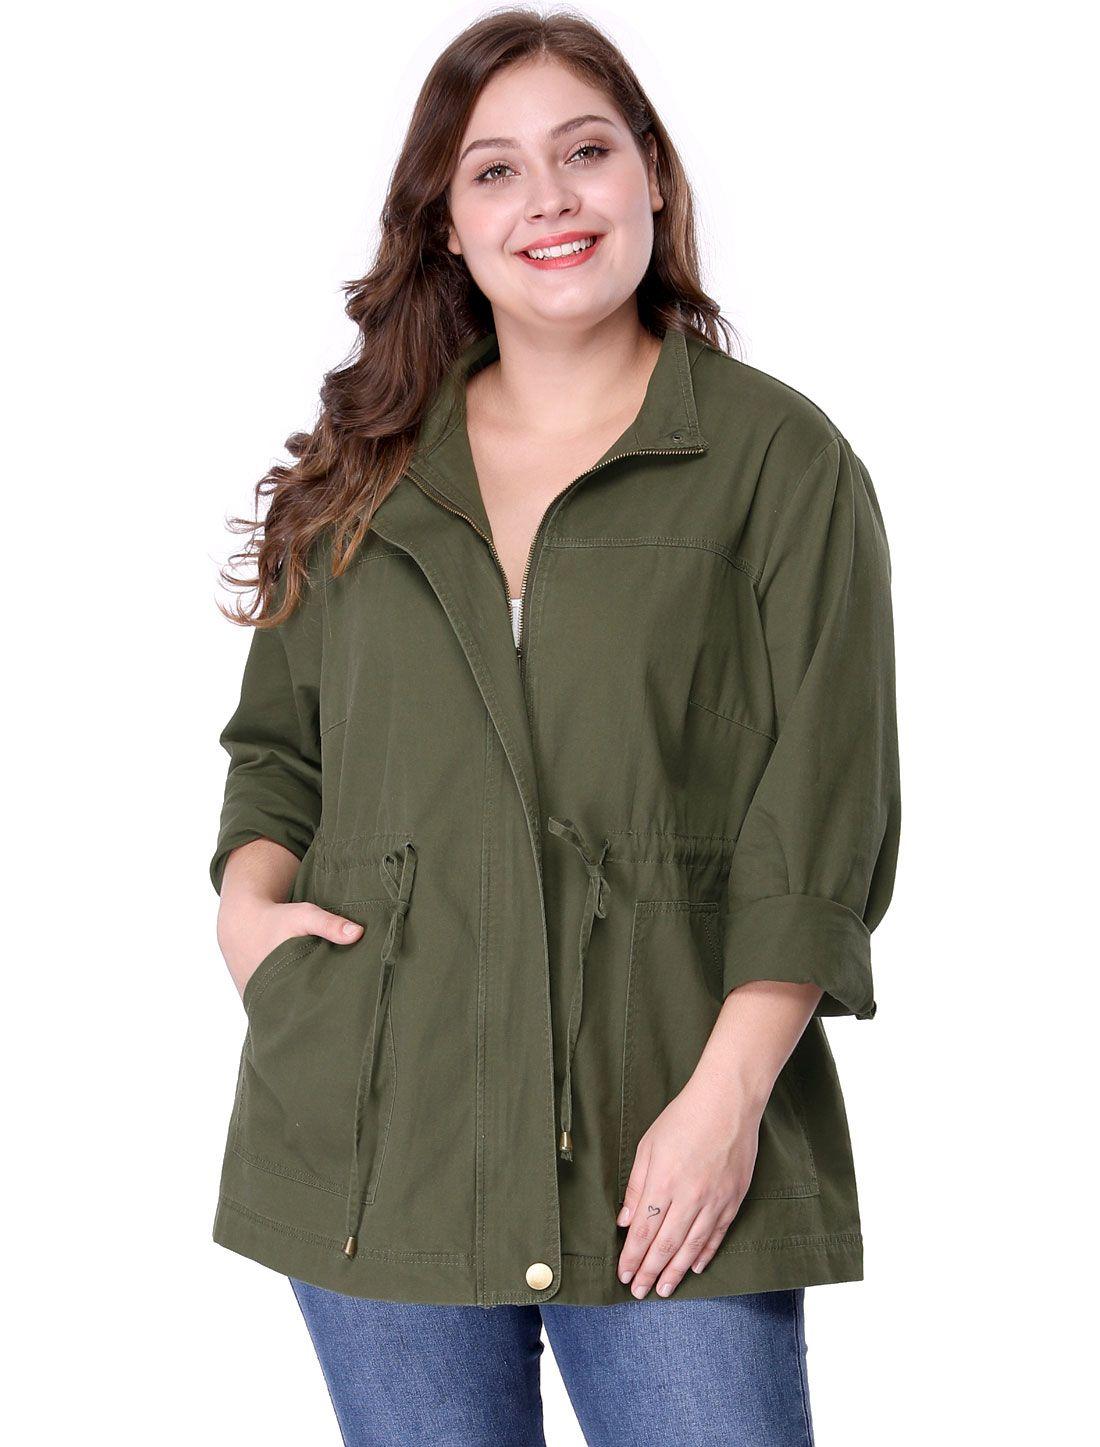 b9b61890344 Women s Plus Size Stand Collar Drawstring Utility Jacket - Outerwear